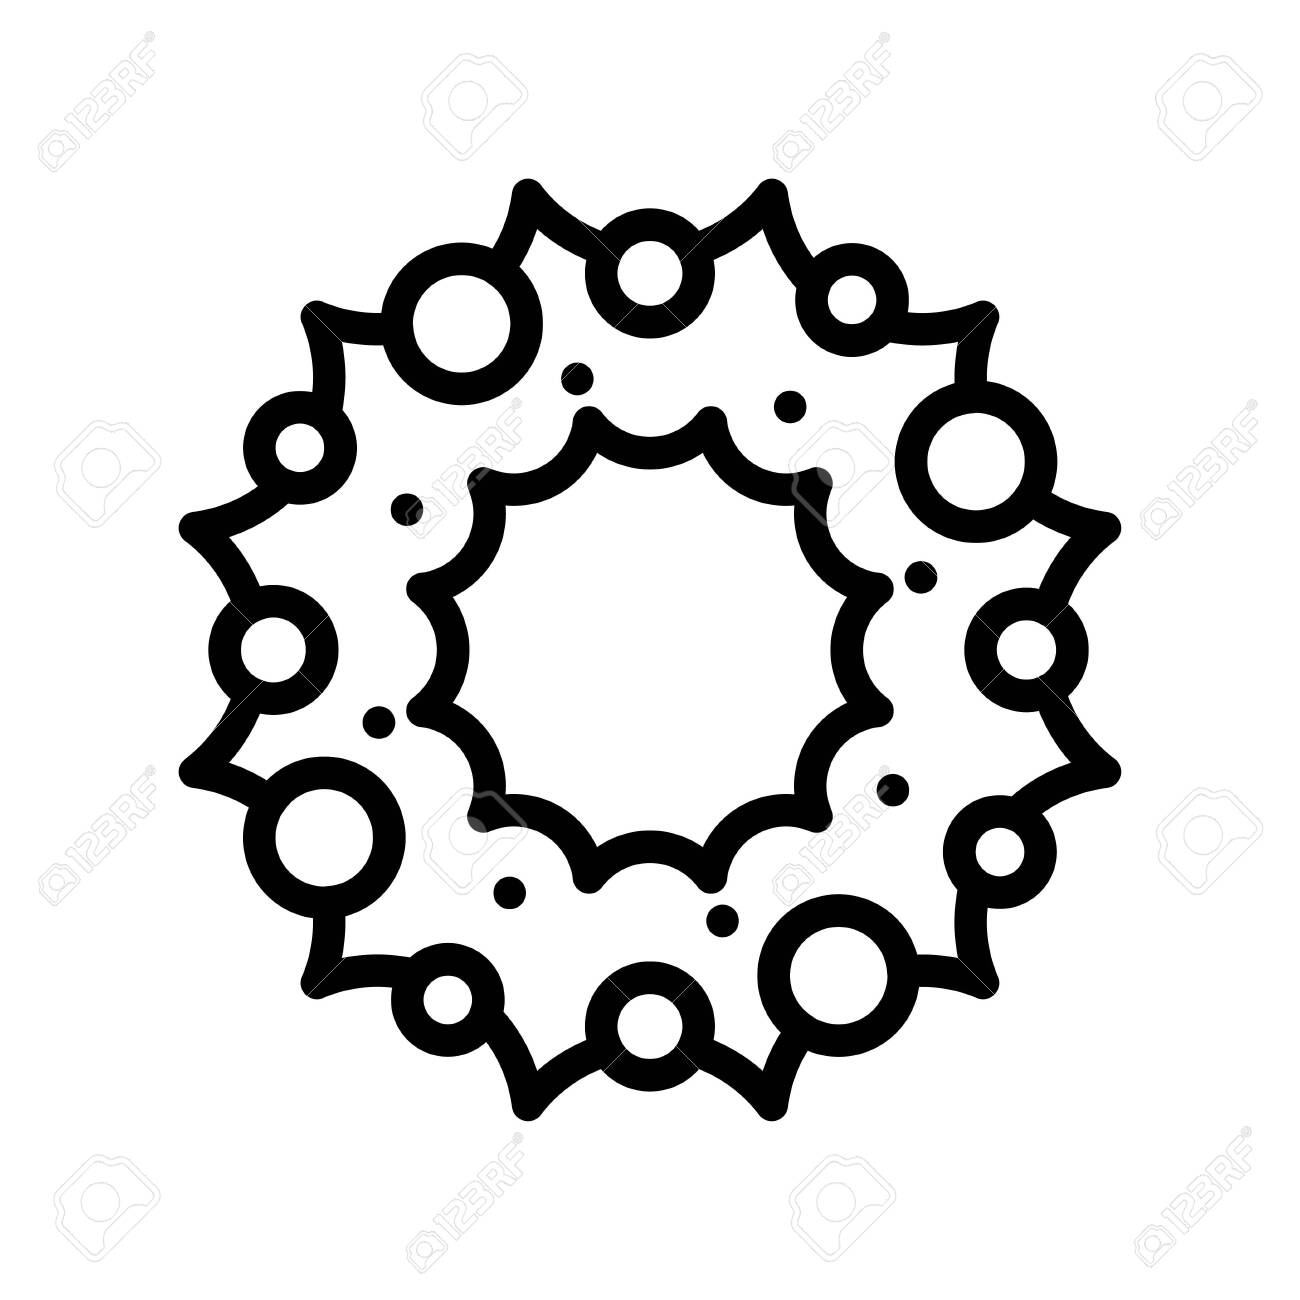 Christmas Wreath vector illustration, line style icon - 136139963